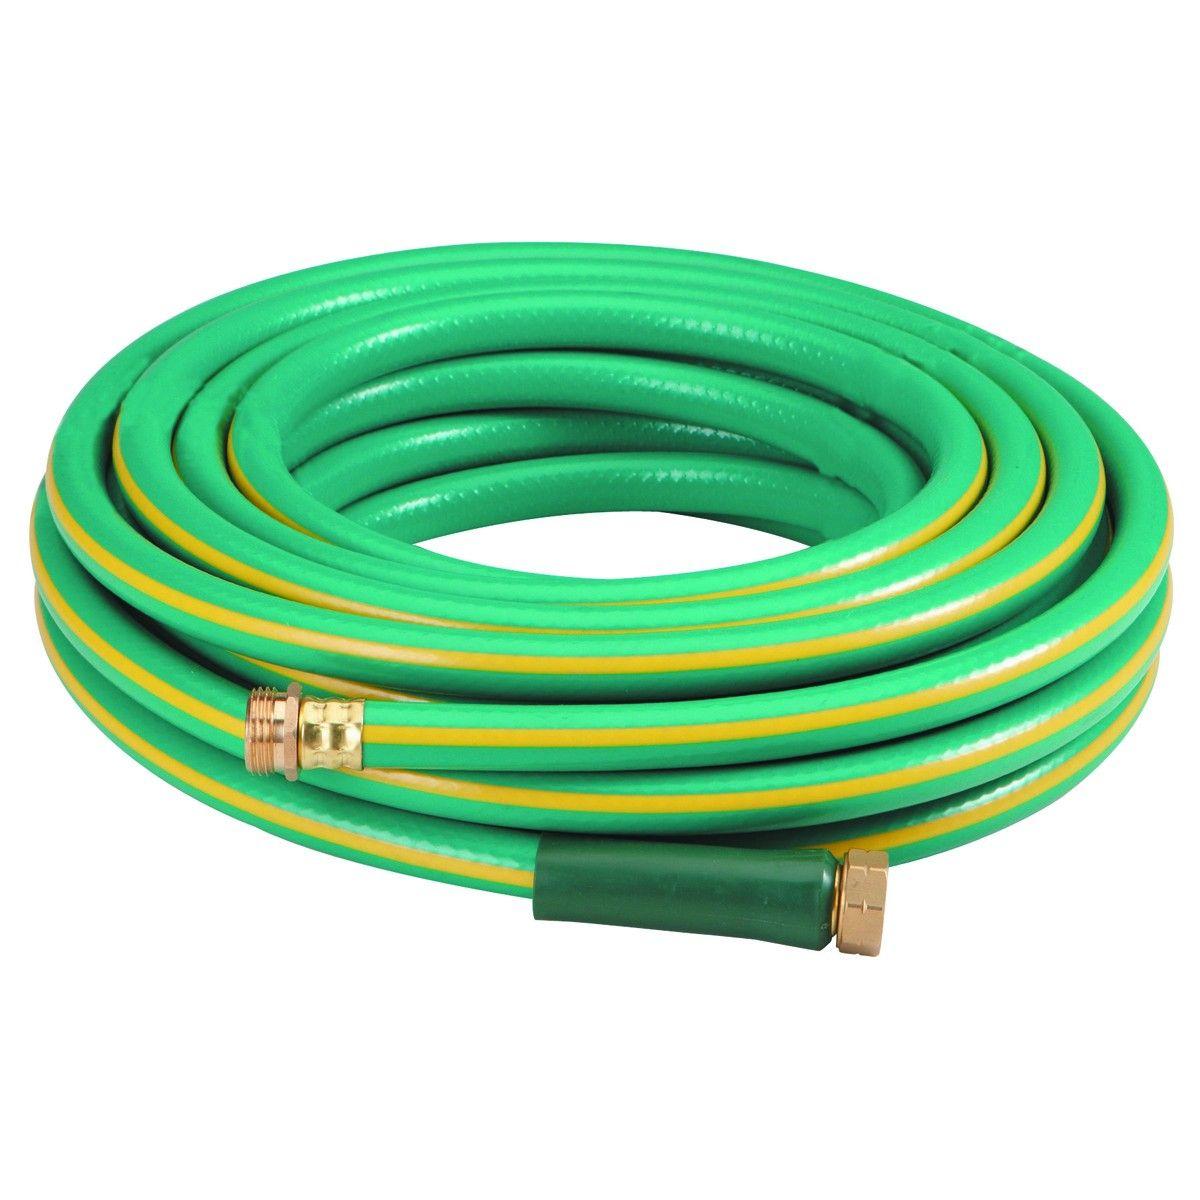 25 foot garden hose. garden hose 25 foot